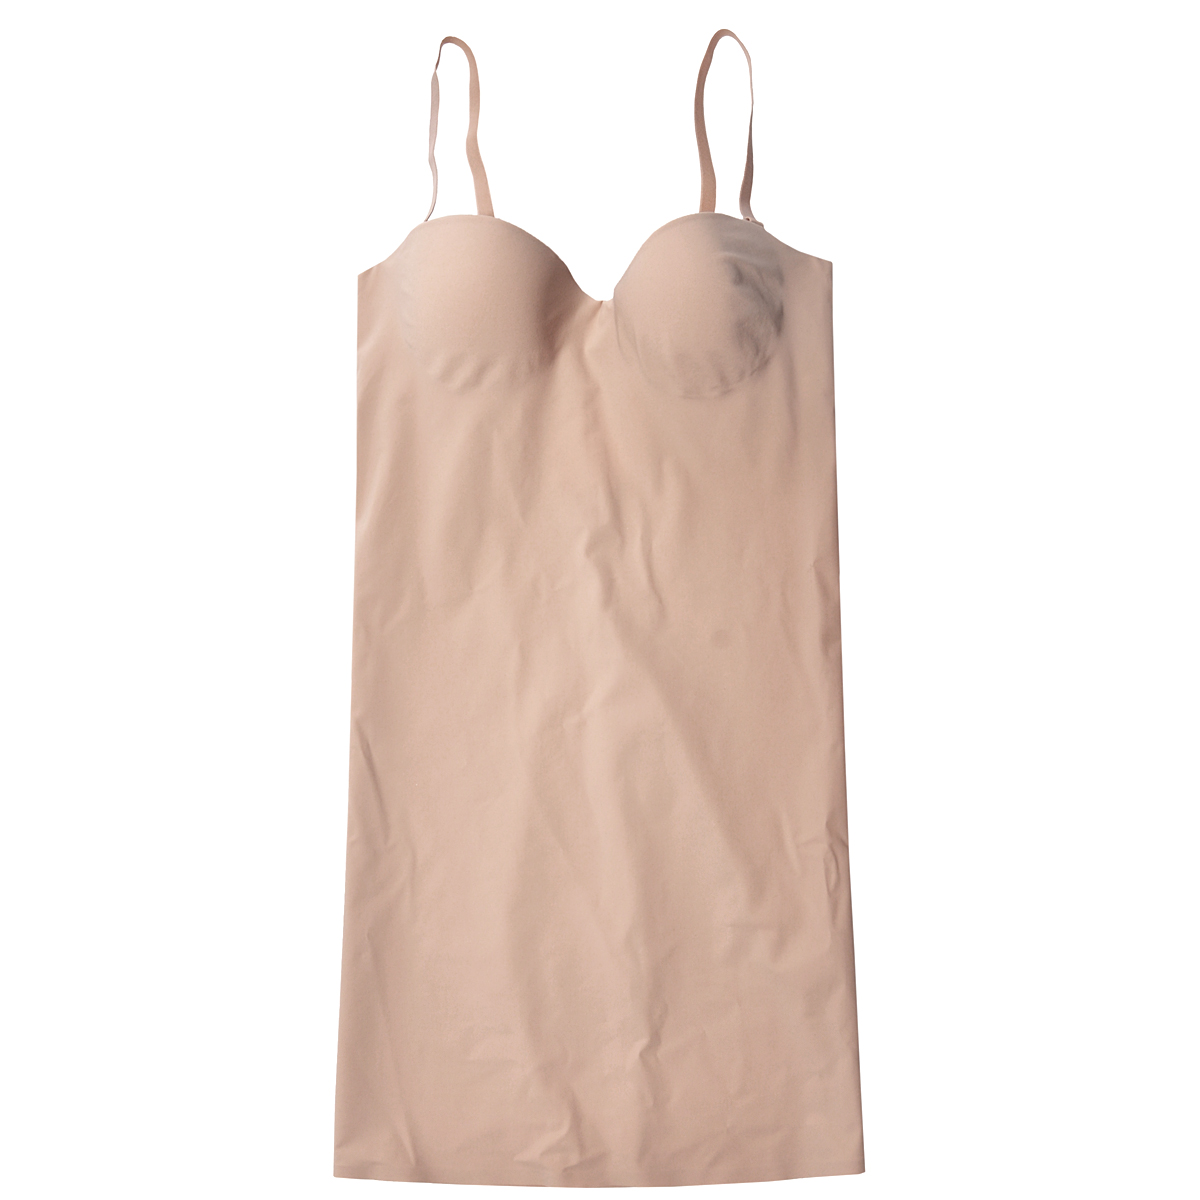 Платье Magic BodyFashion Shape-Up Dress, корректирующее, цвет: бежевый. 18SD. Размер 80B